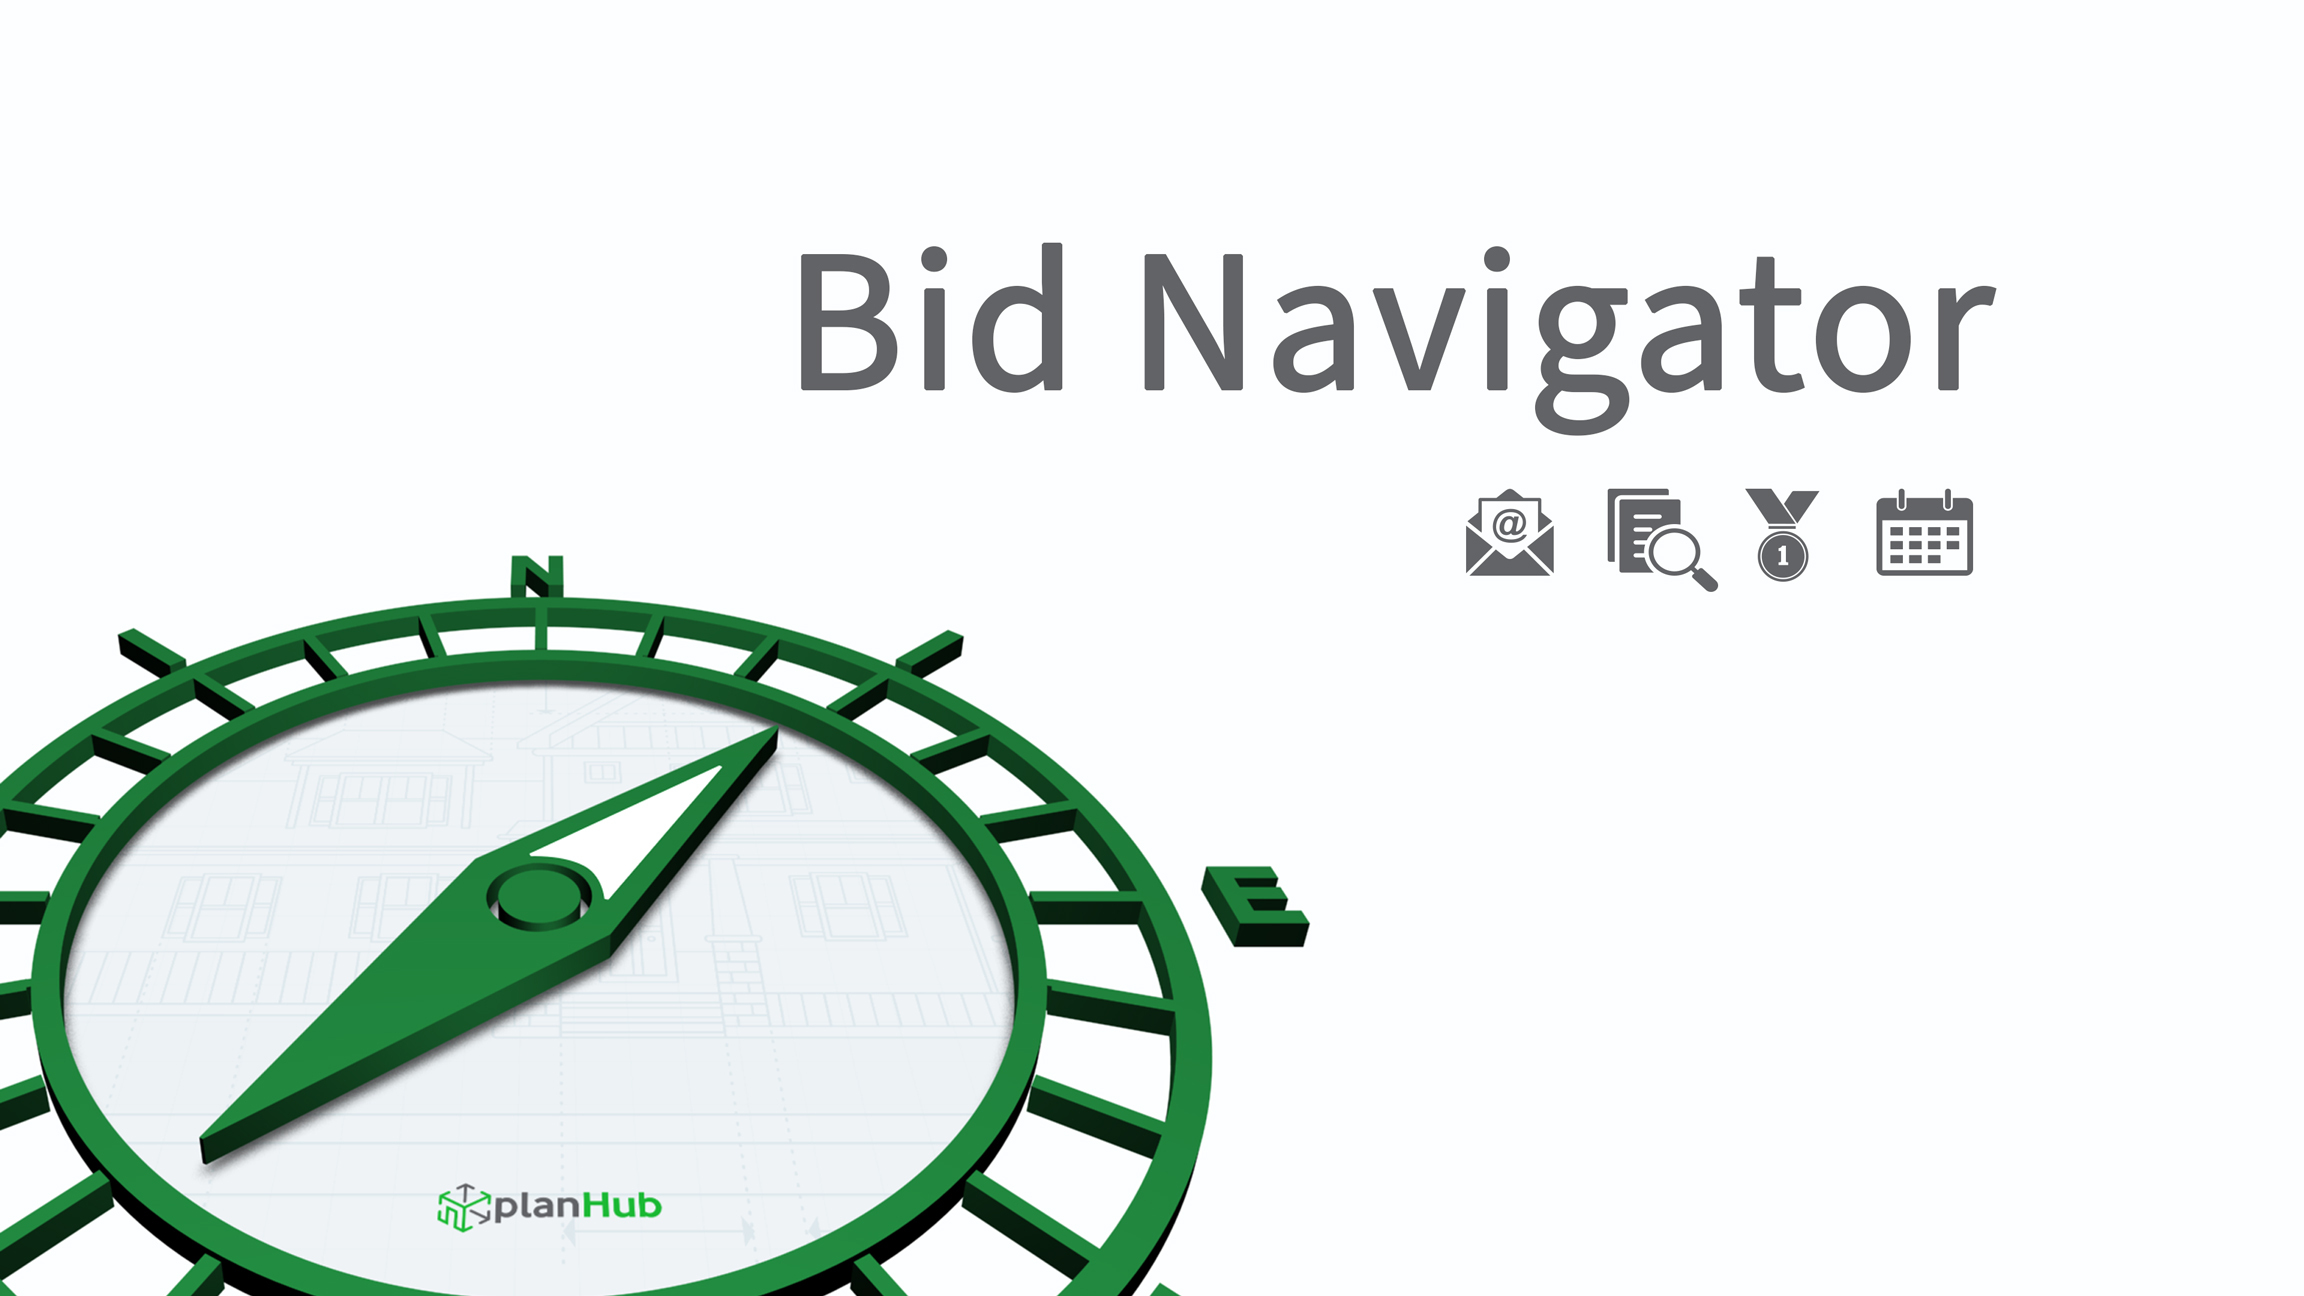 PlanHub Announces the Launch of Bid Navigator for Subcontractors